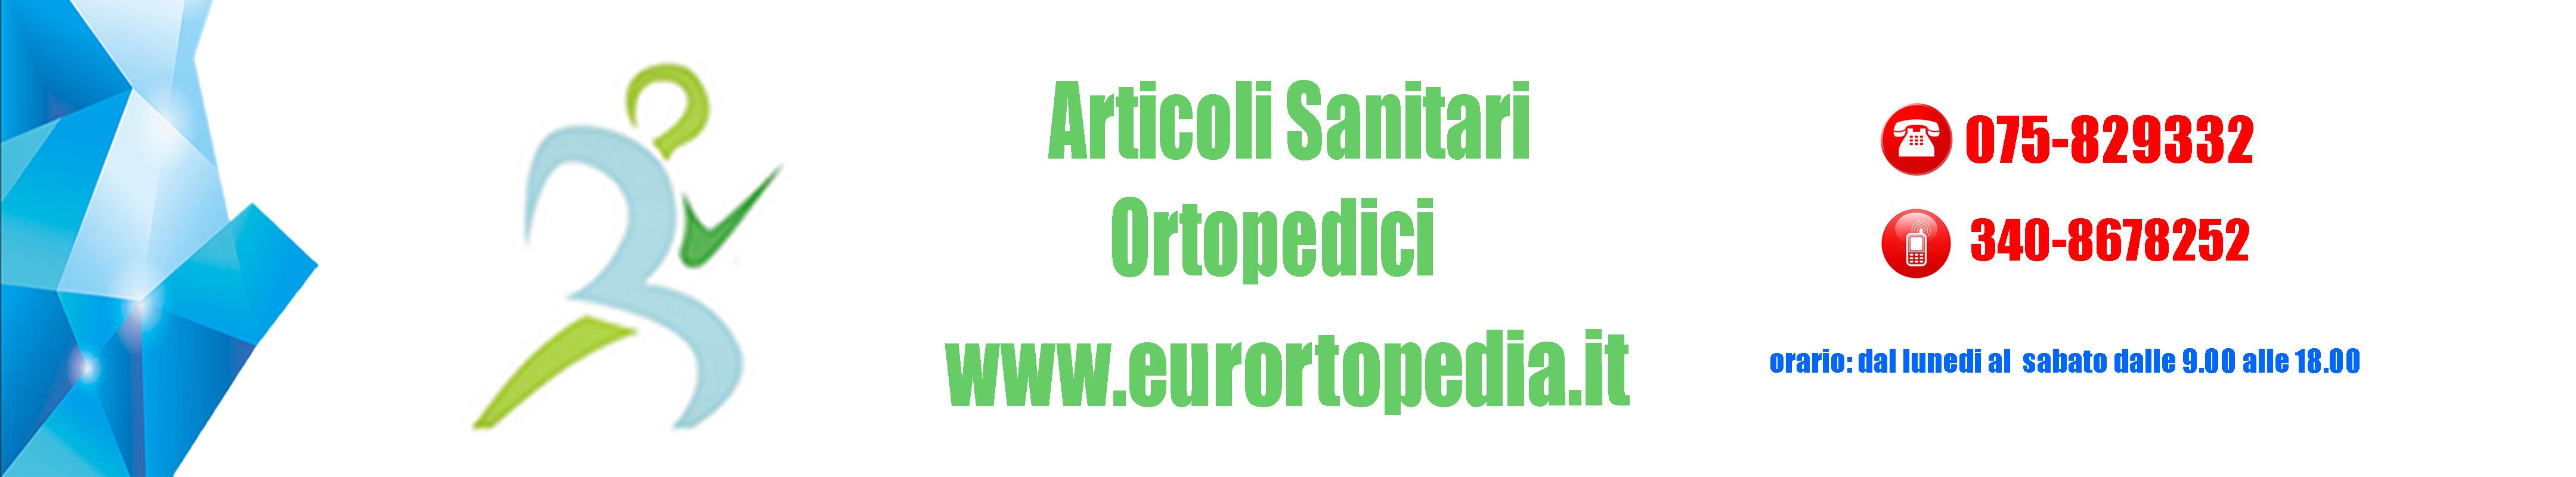 Eurortopedia